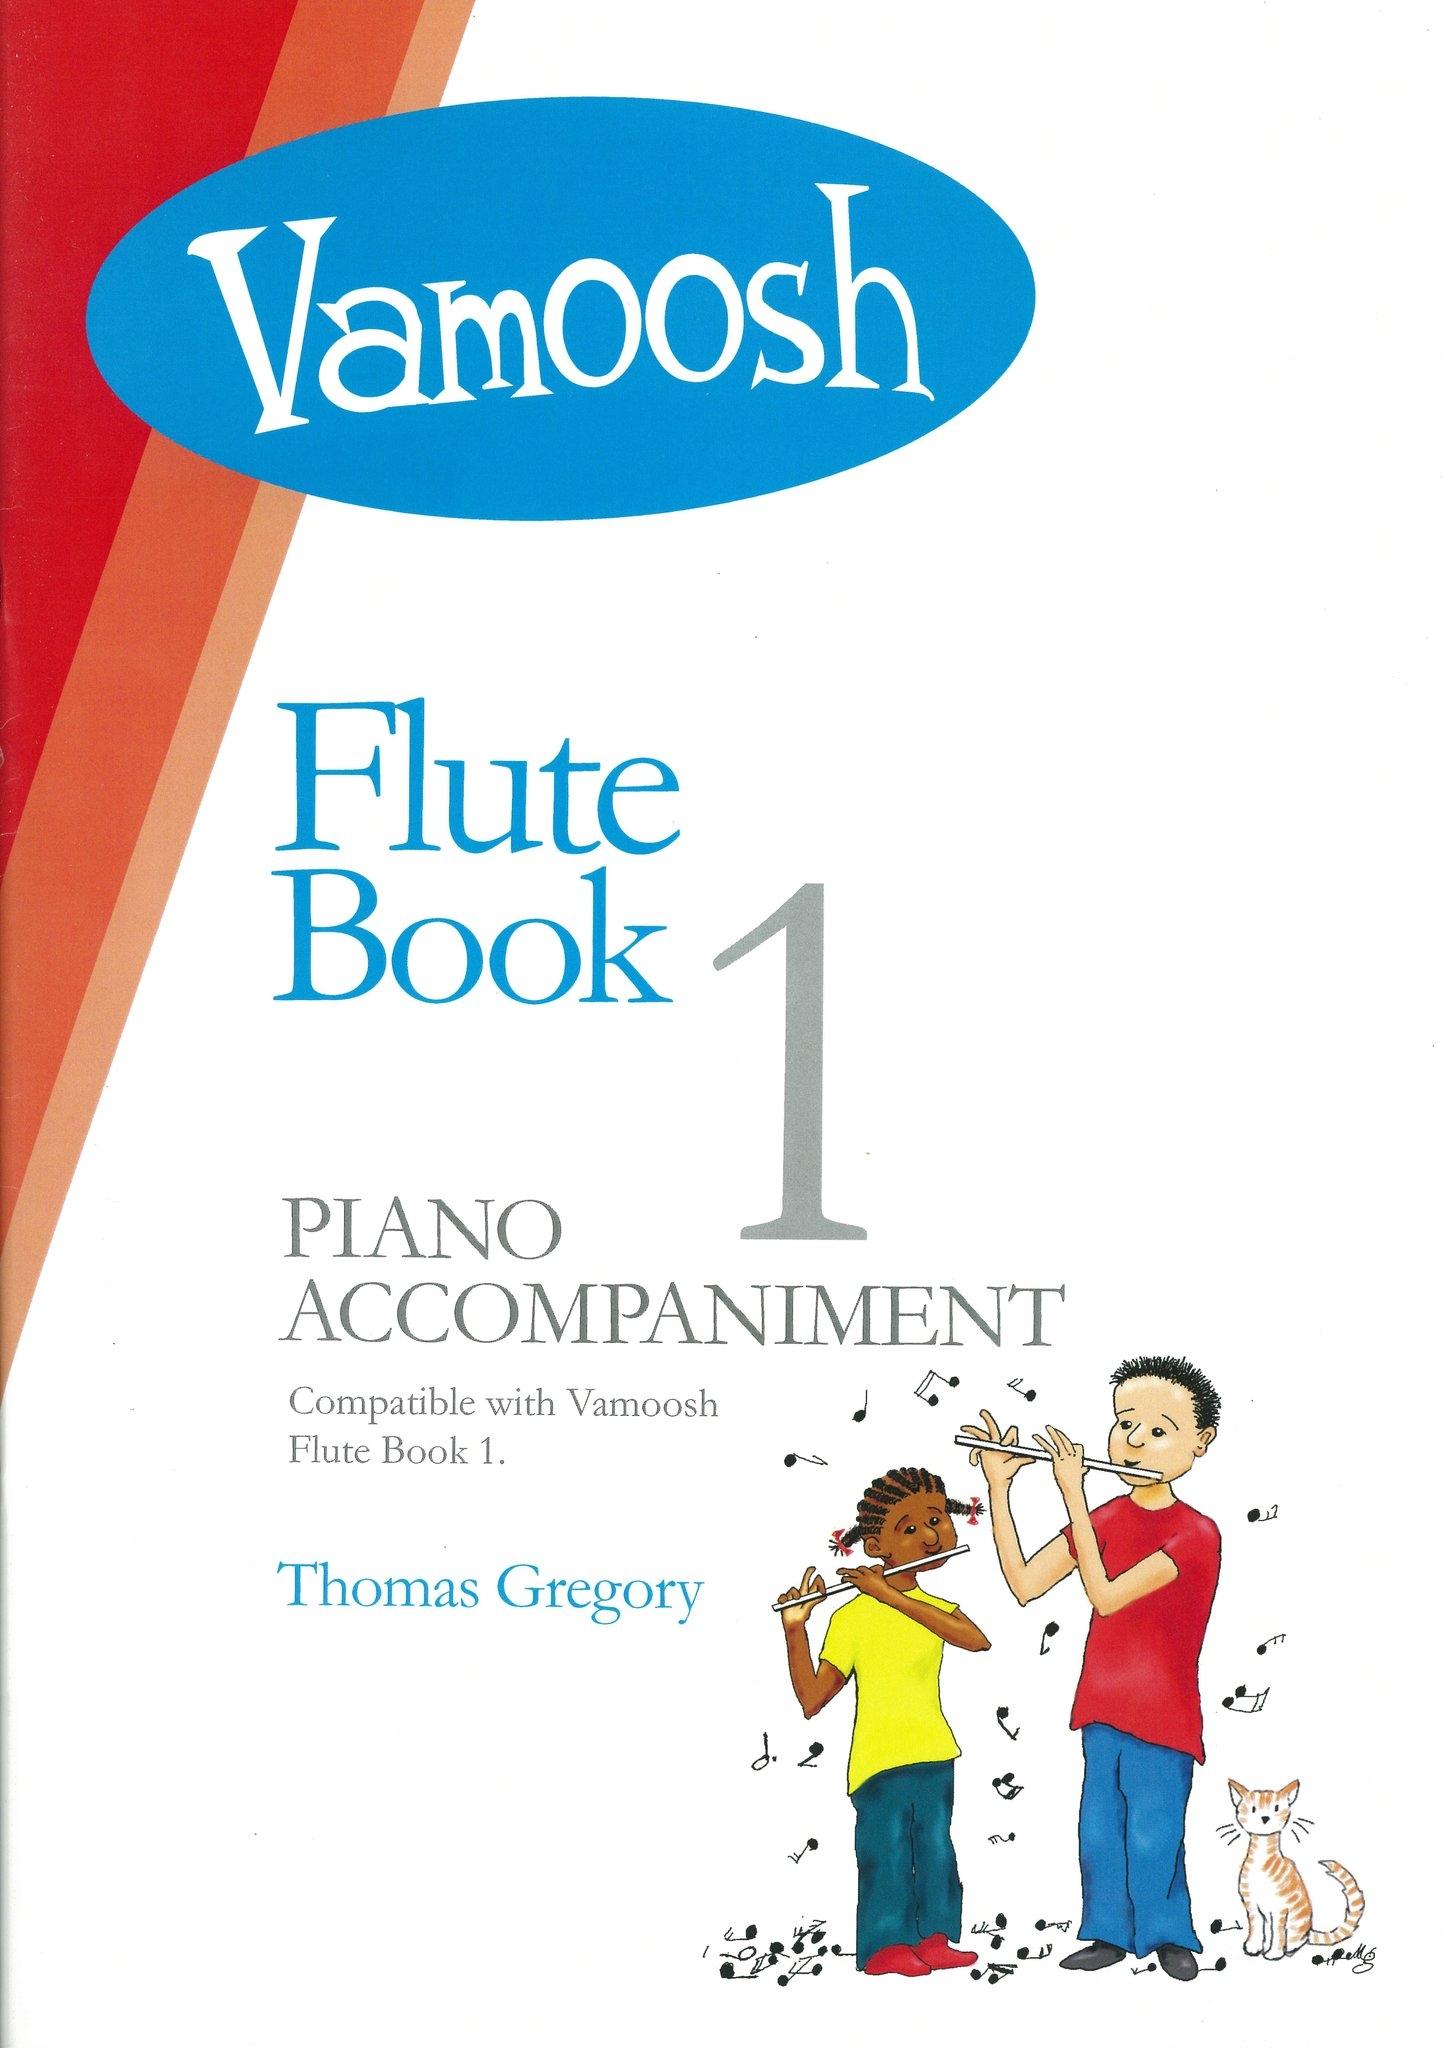 Thomas Gregory: Vamoosh Flute Book 1 Piano Accompaniment: Piano Accompaniment: